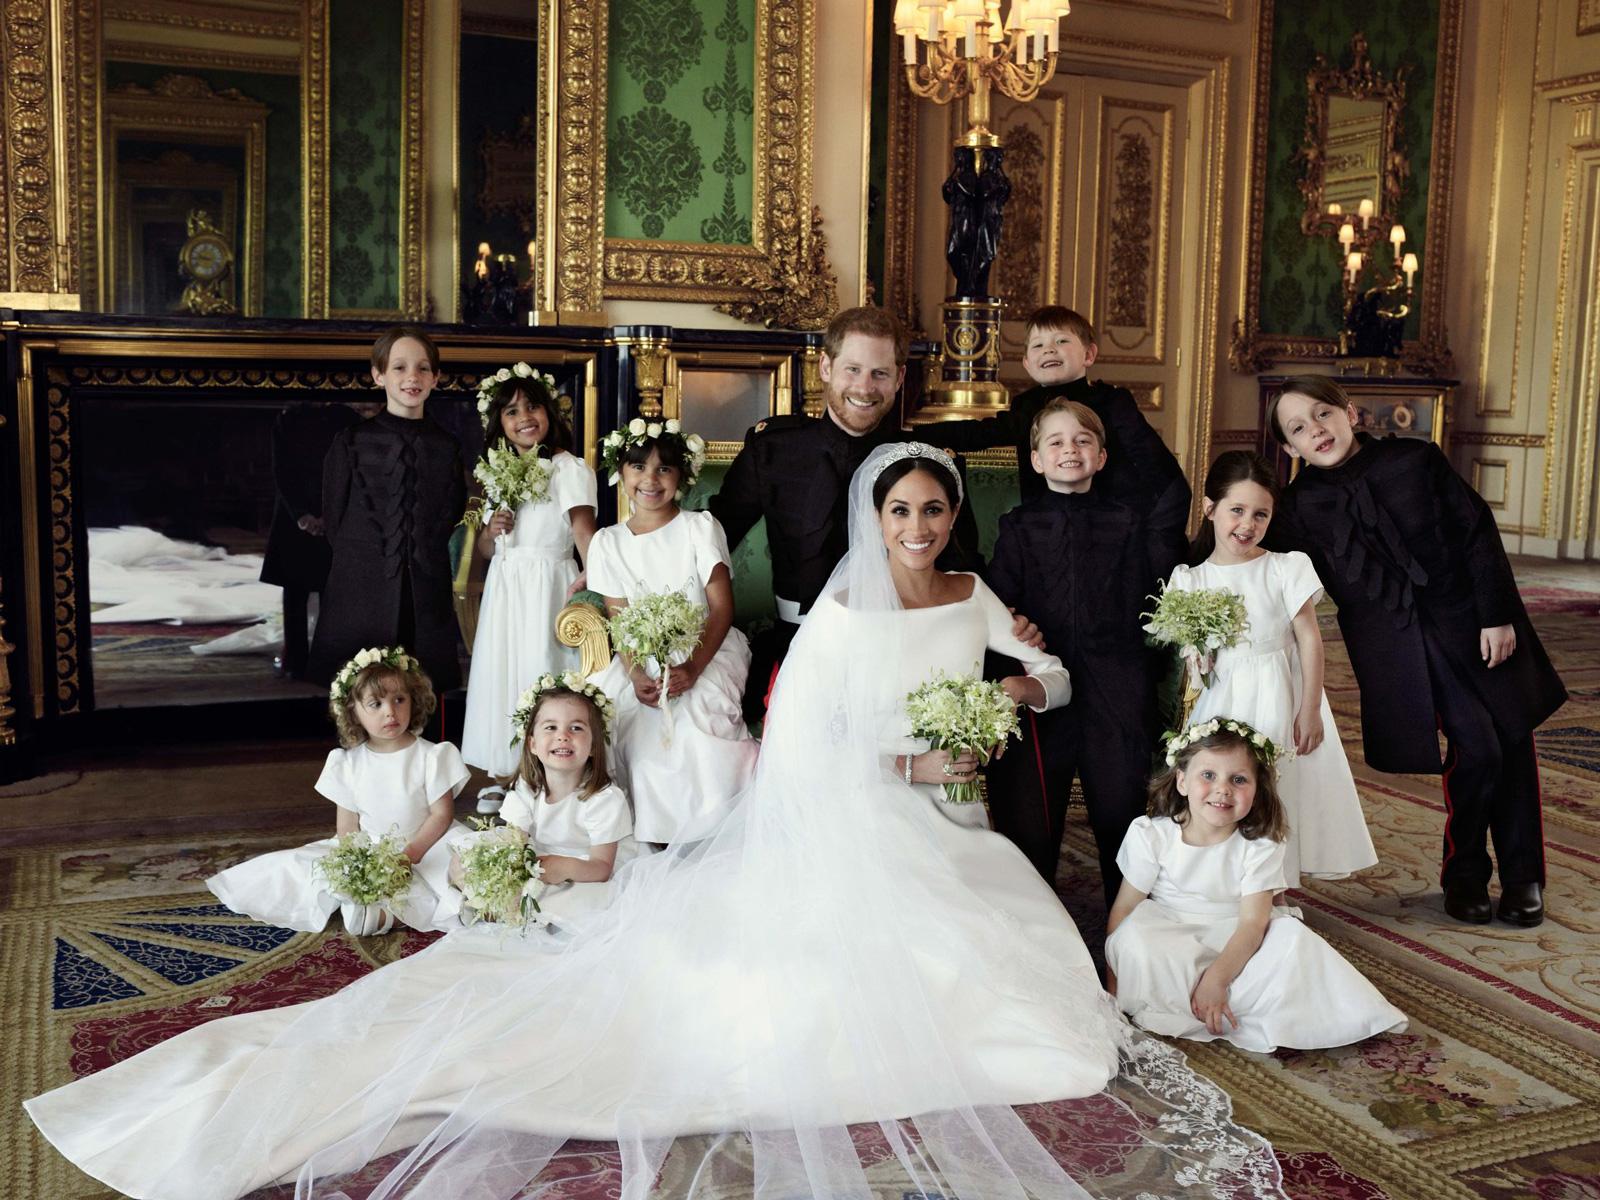 acbeceab299 Royal Wedding Trends You Will See Everywhere  Greenery